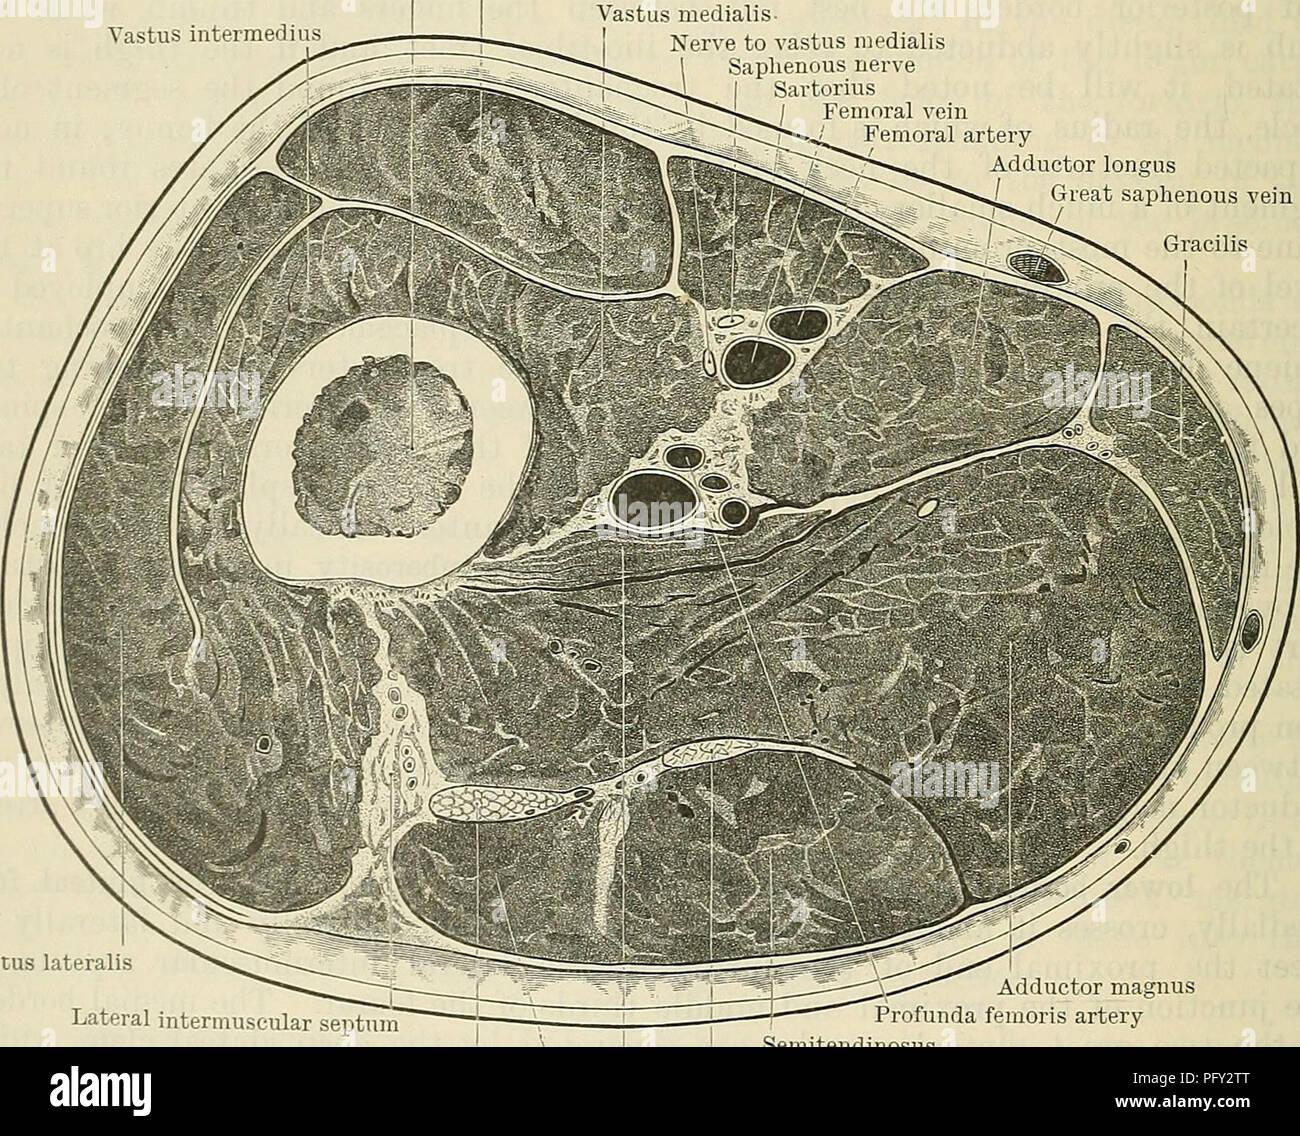 Cunninghams Lehrbuch der Anatomie. Anatomie. 1456 SUEGICAL SUKFACE ...